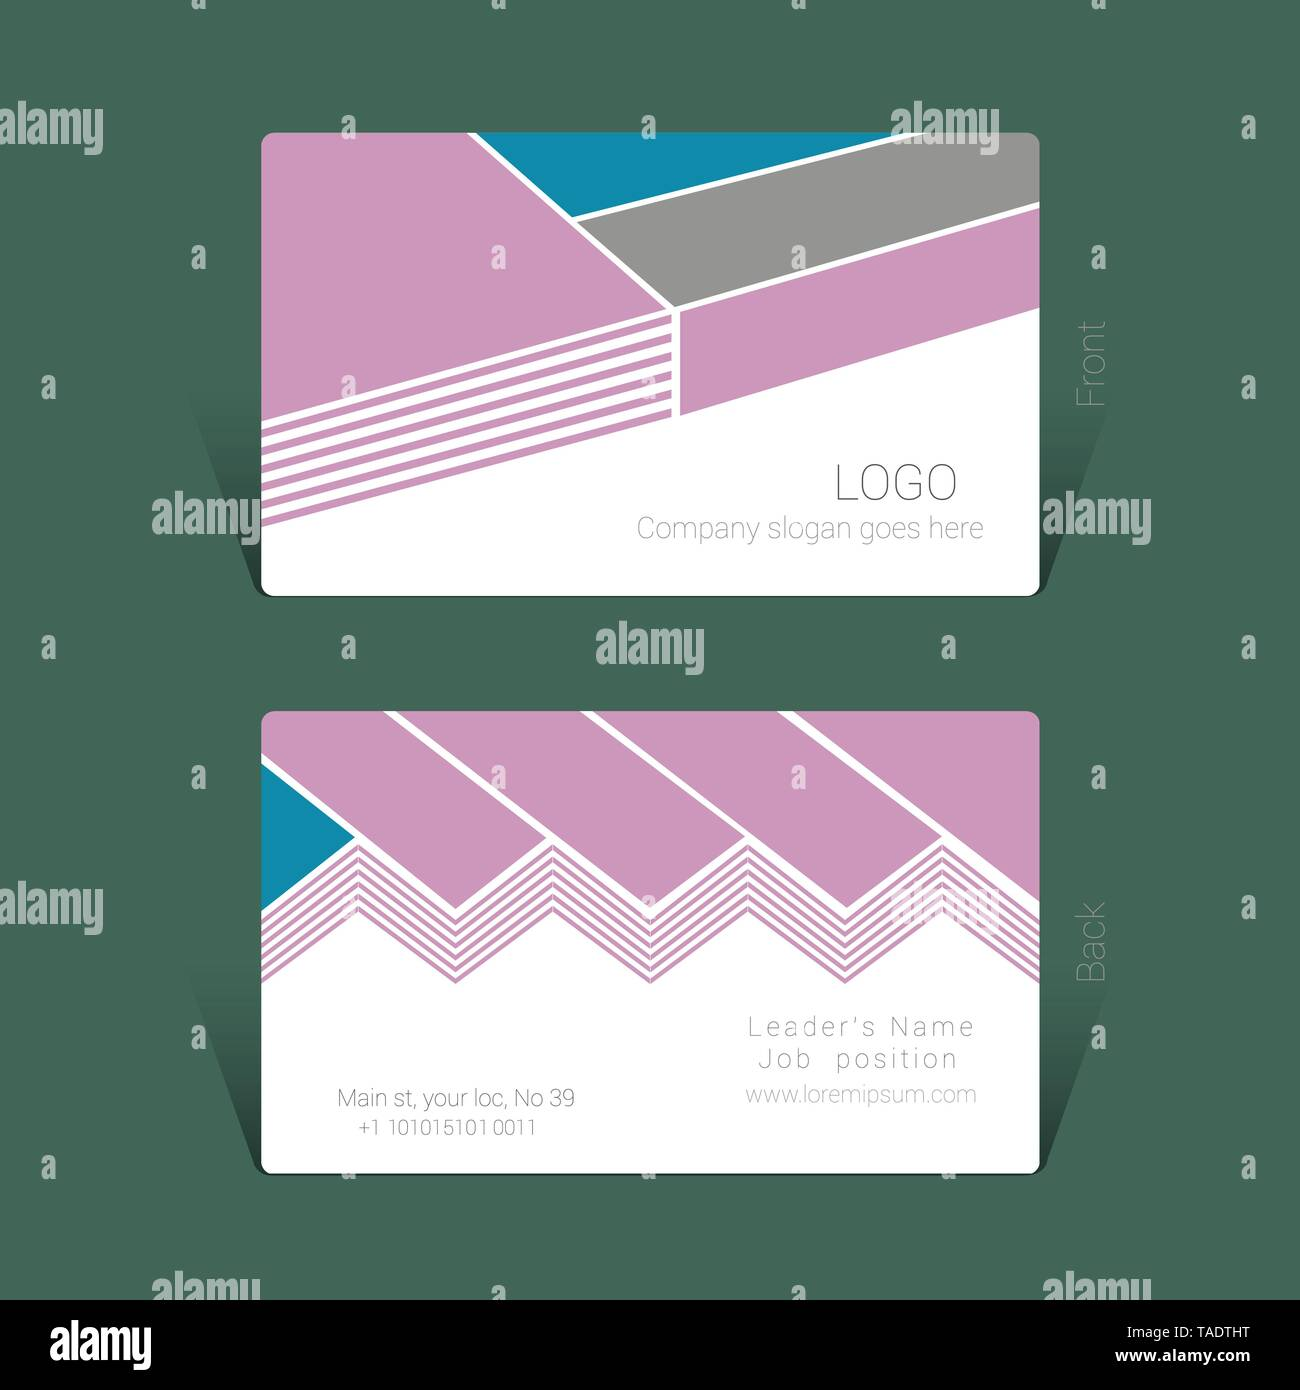 Business Card Design vorlage, Vector Illustration Konzept Stockbild